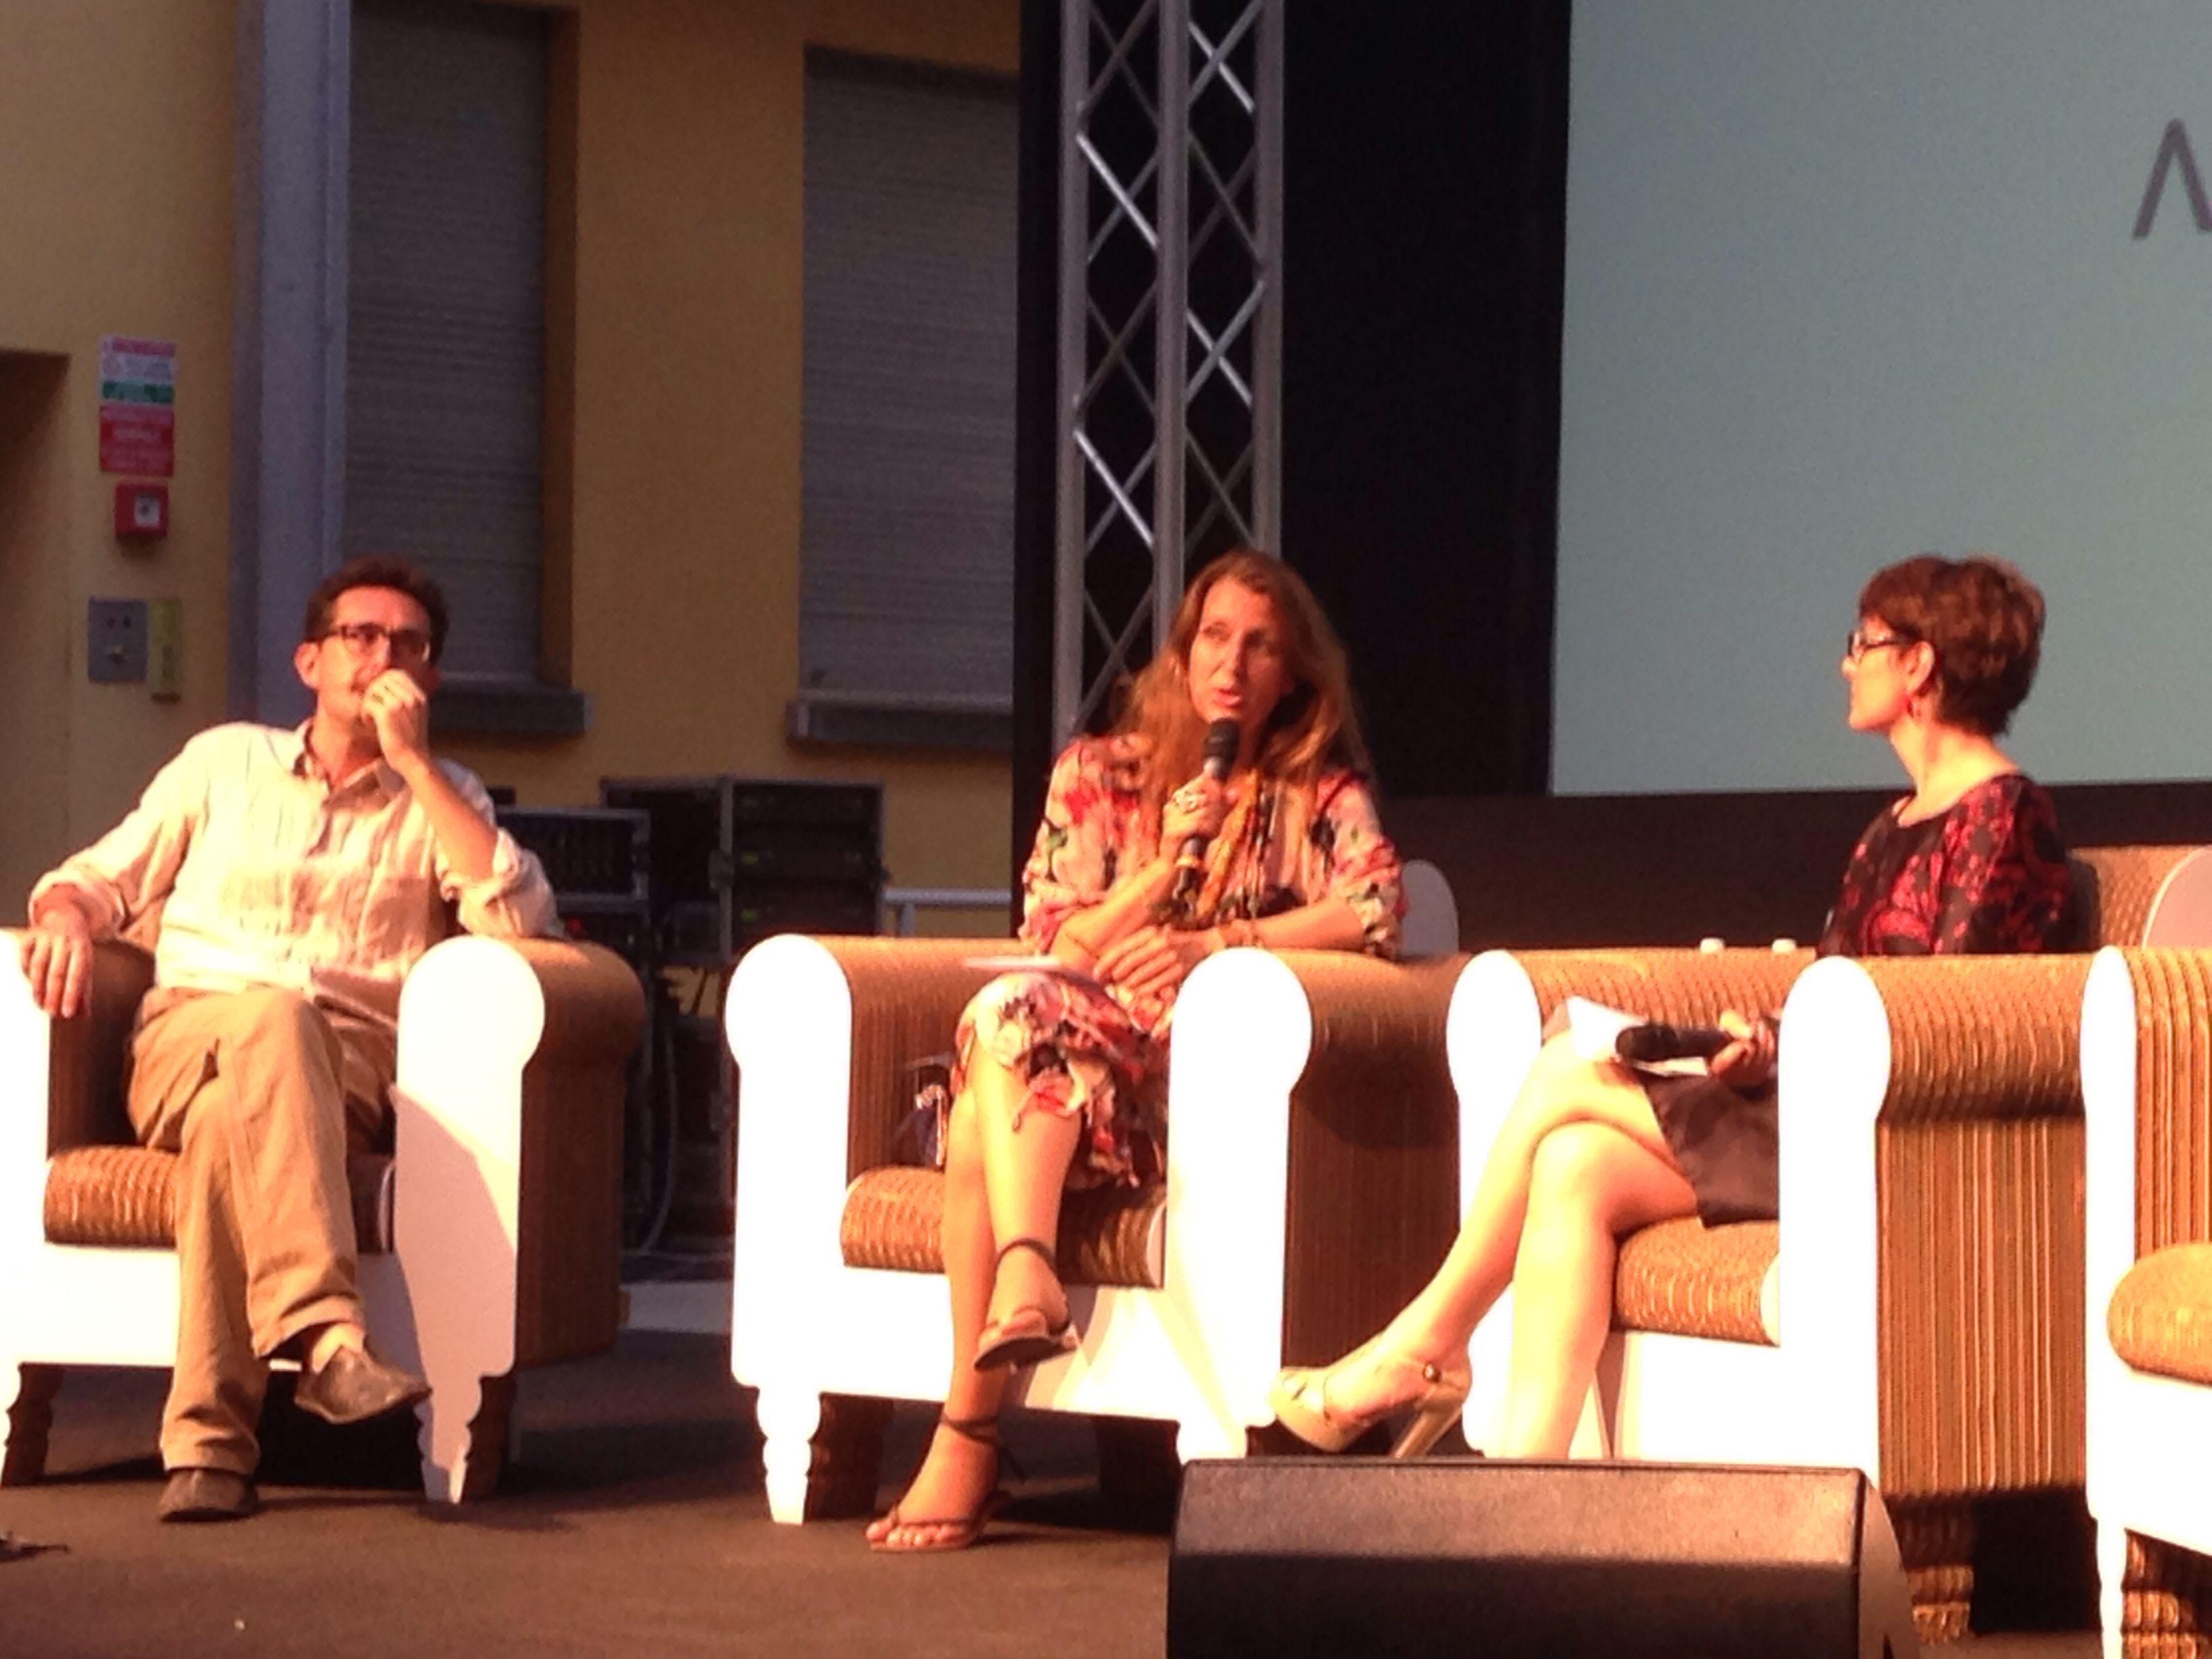 #AIC2014 #dialoghidelfestival #lavorare